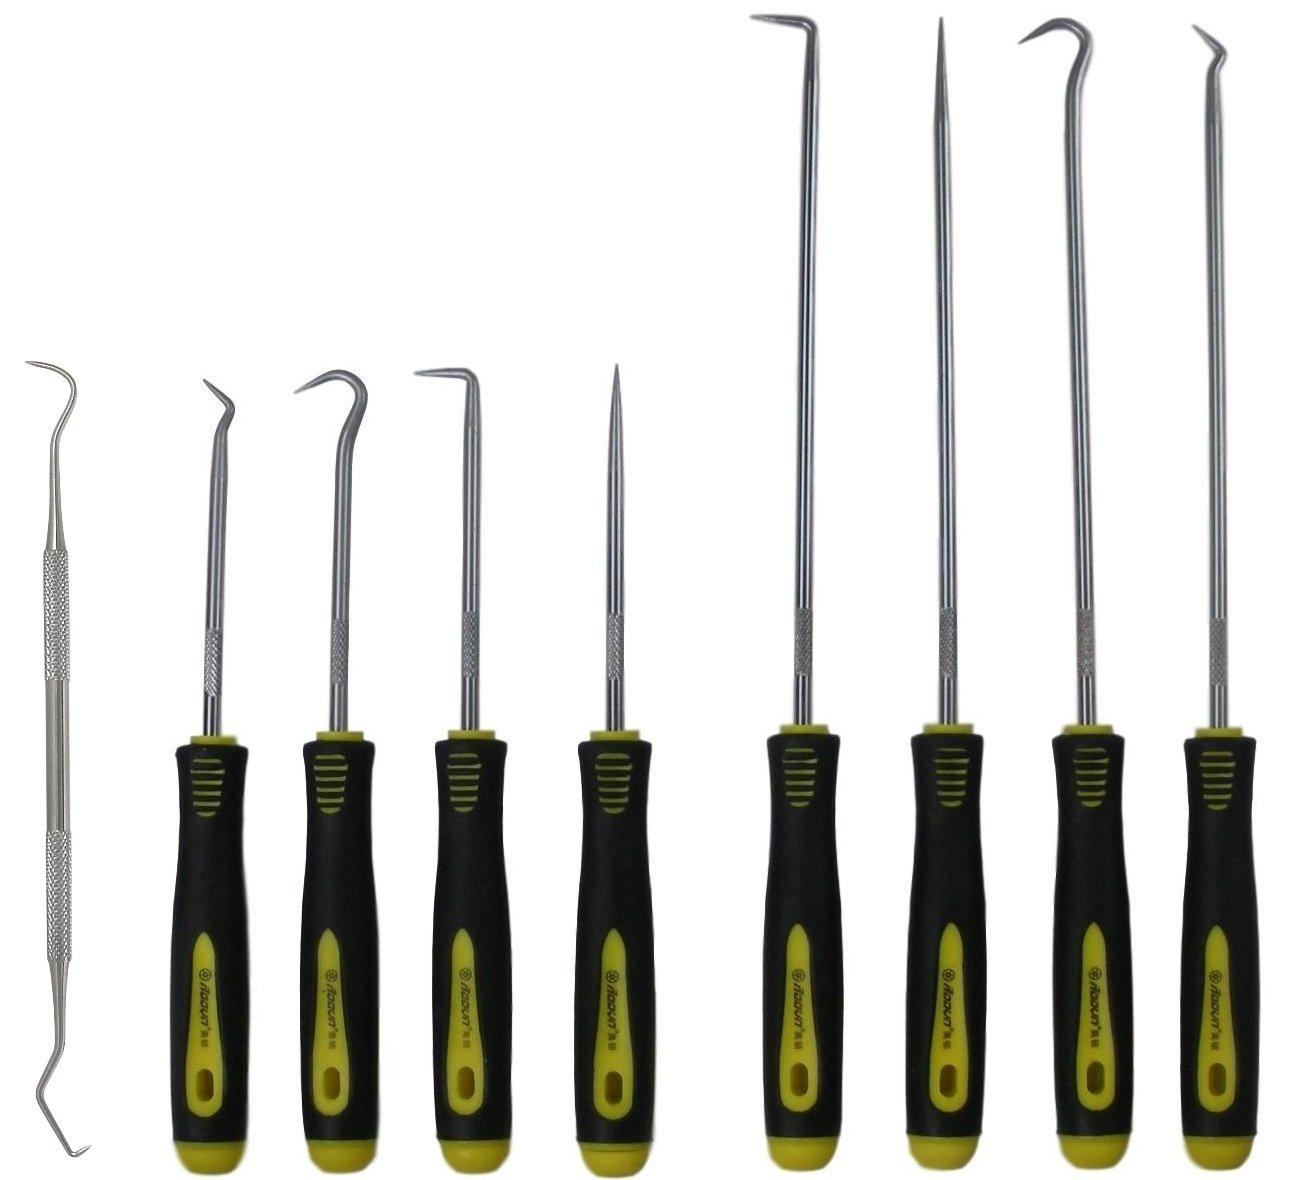 9 pcs Long and Short Pick Hook Set plus O-ring Tool